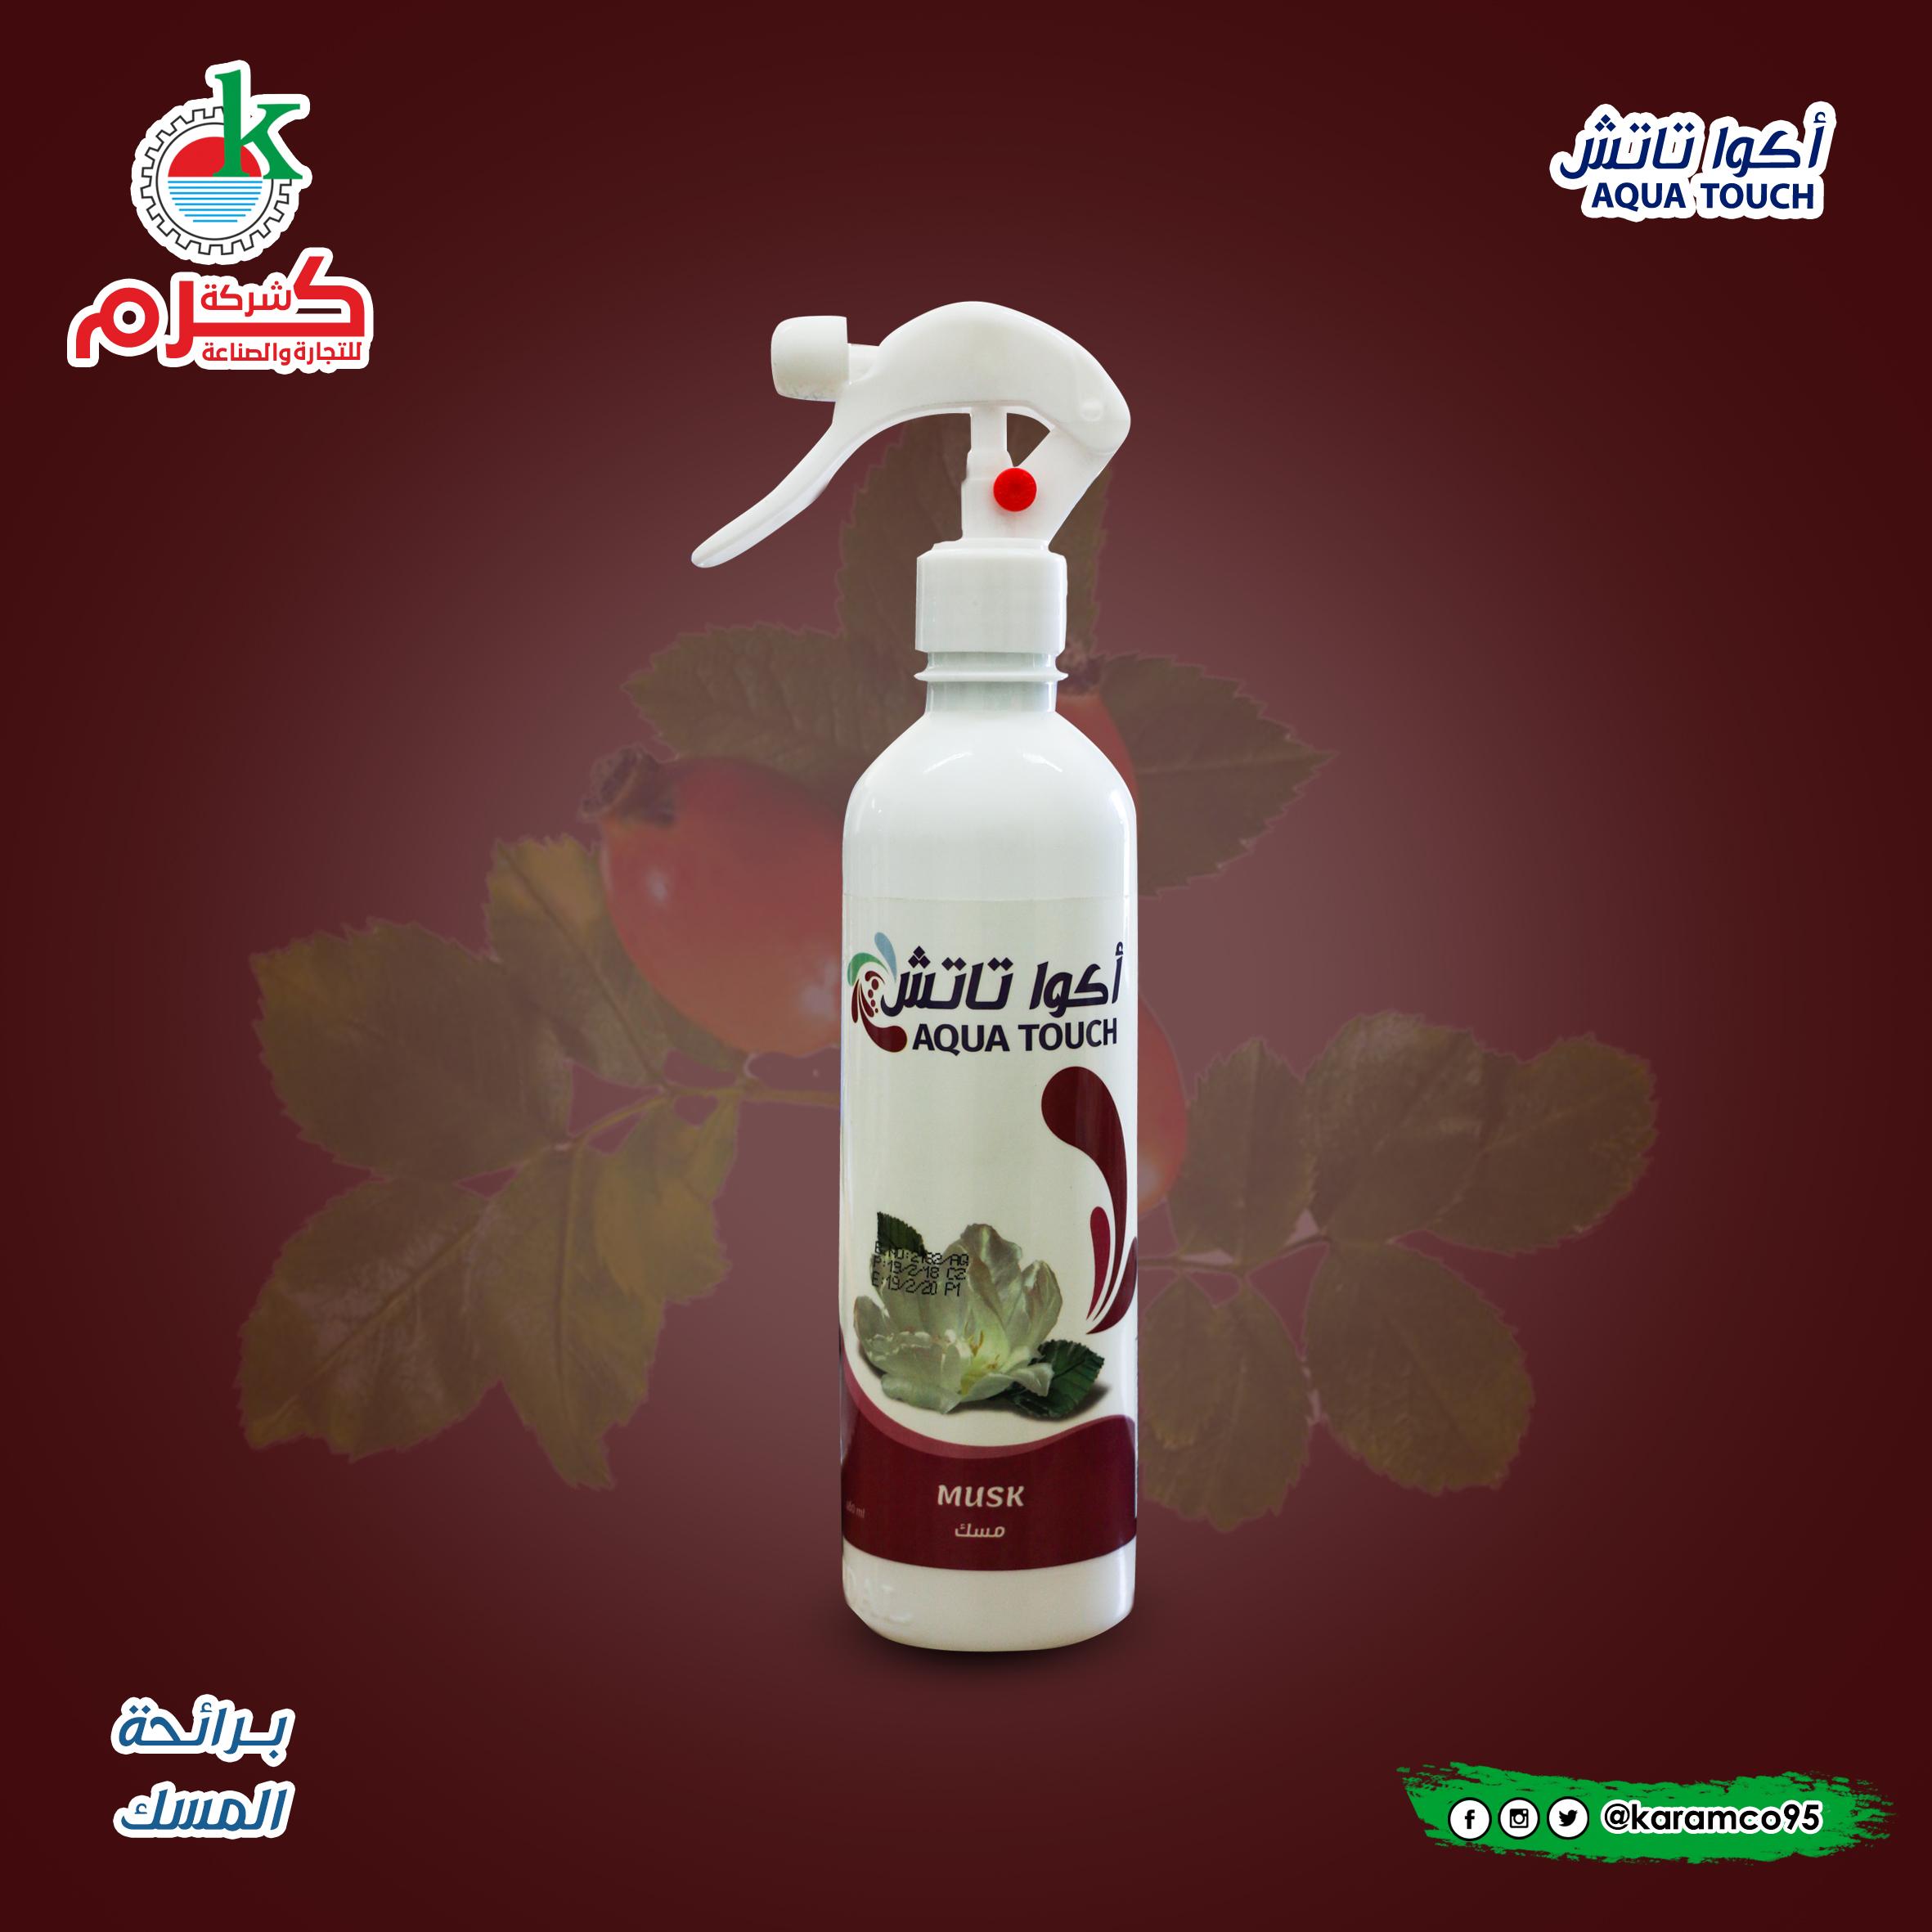 Aqua Touch Air Freshener Musk